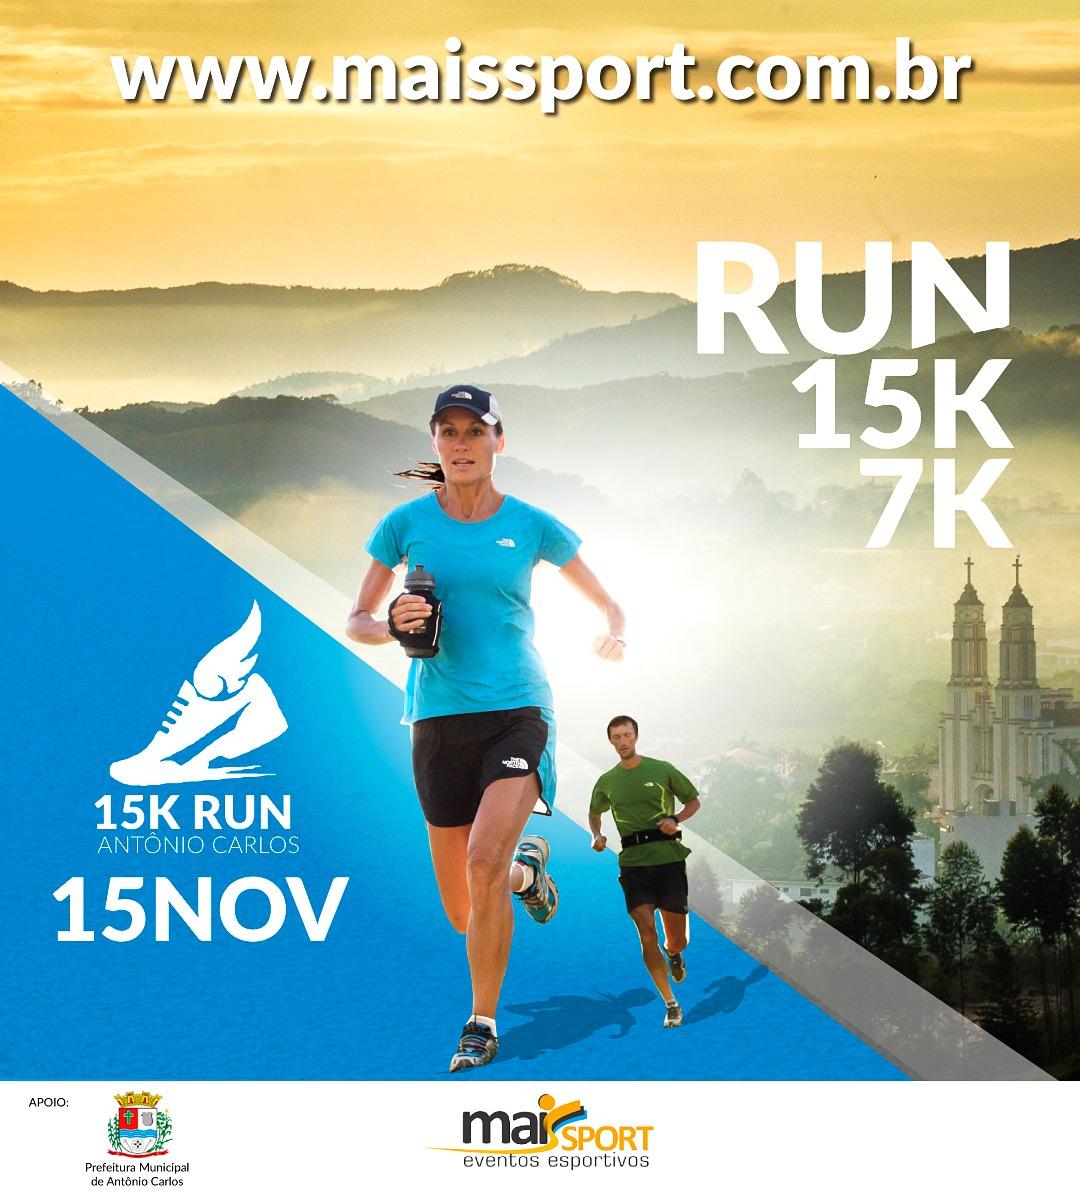 15/11/18 - 15K Run Antônio Carlos